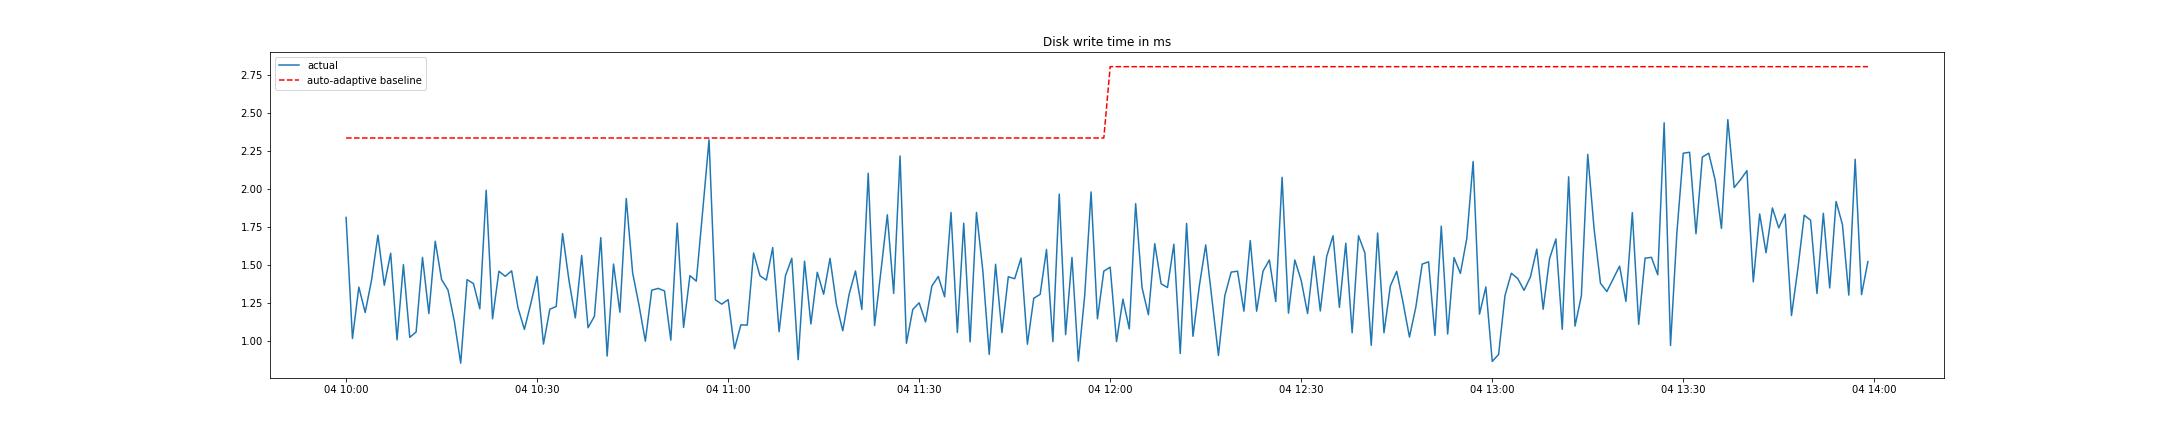 Auto-adaptive baseline for disk write times